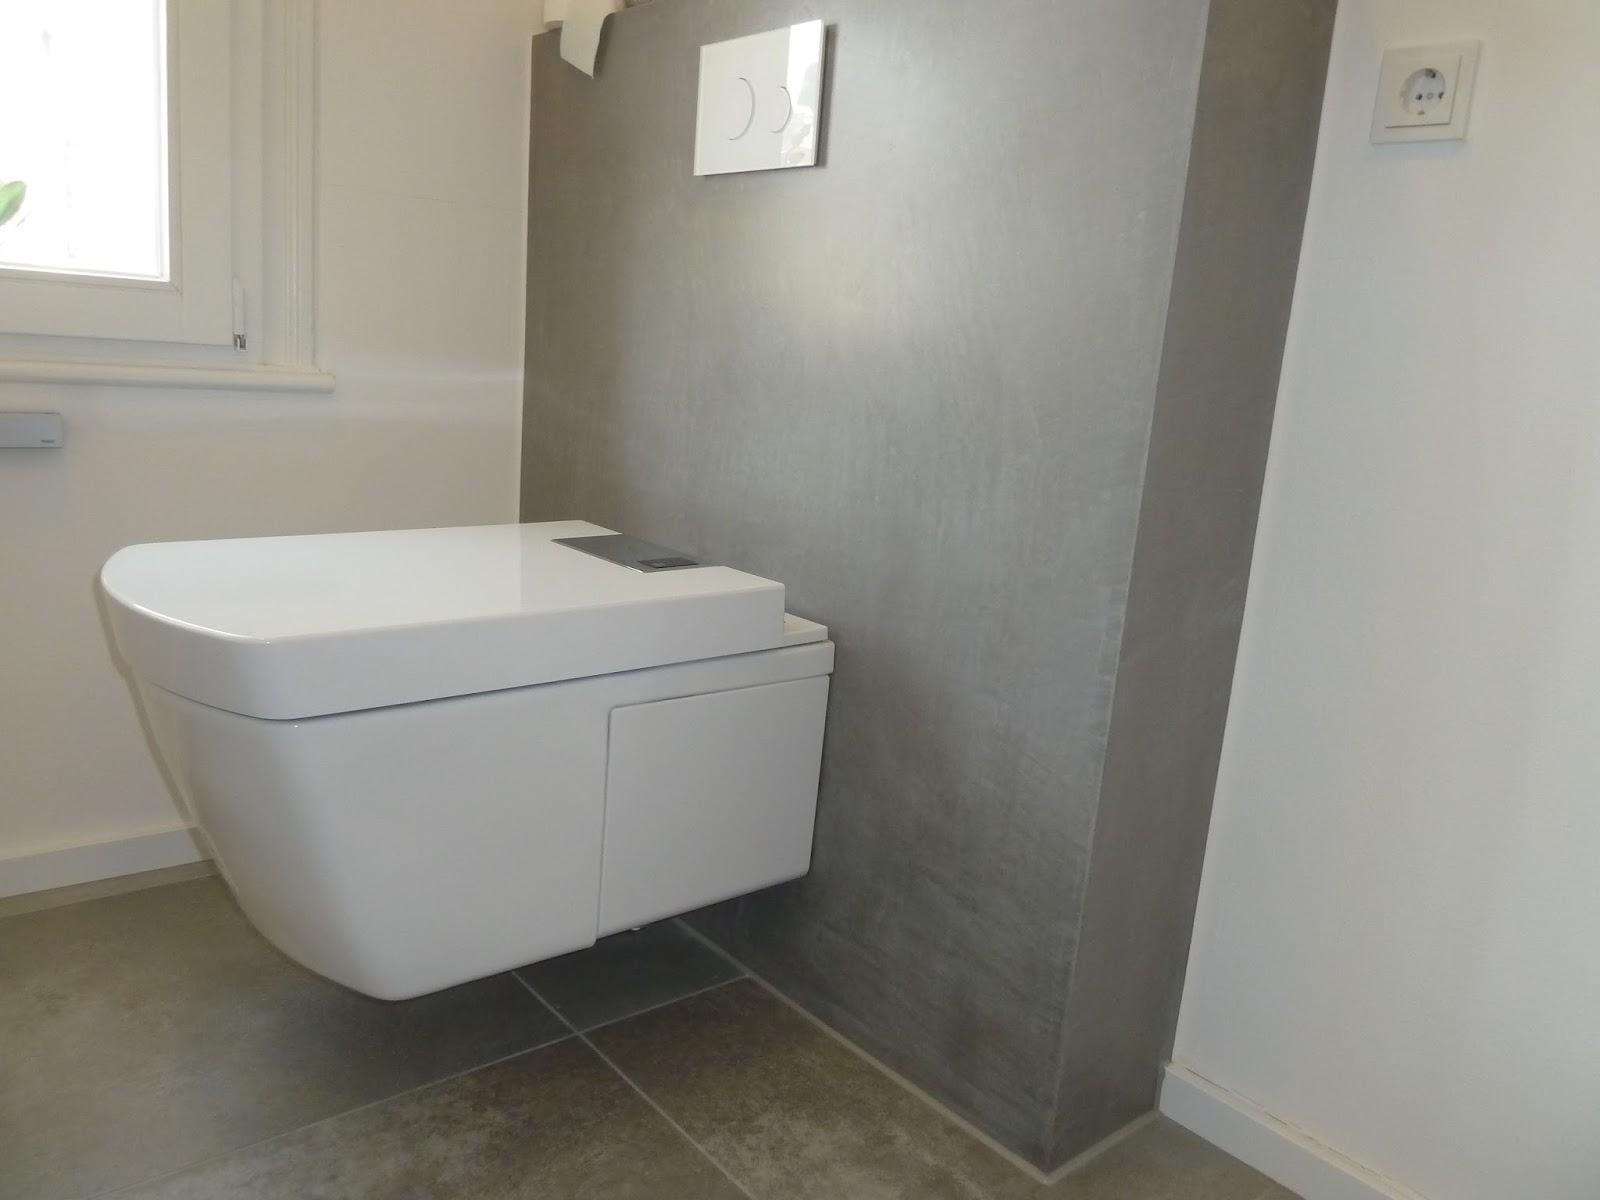 beton cire oberfl chen in beton look beton cire dusche wandbeschichtung in betonoptik. Black Bedroom Furniture Sets. Home Design Ideas